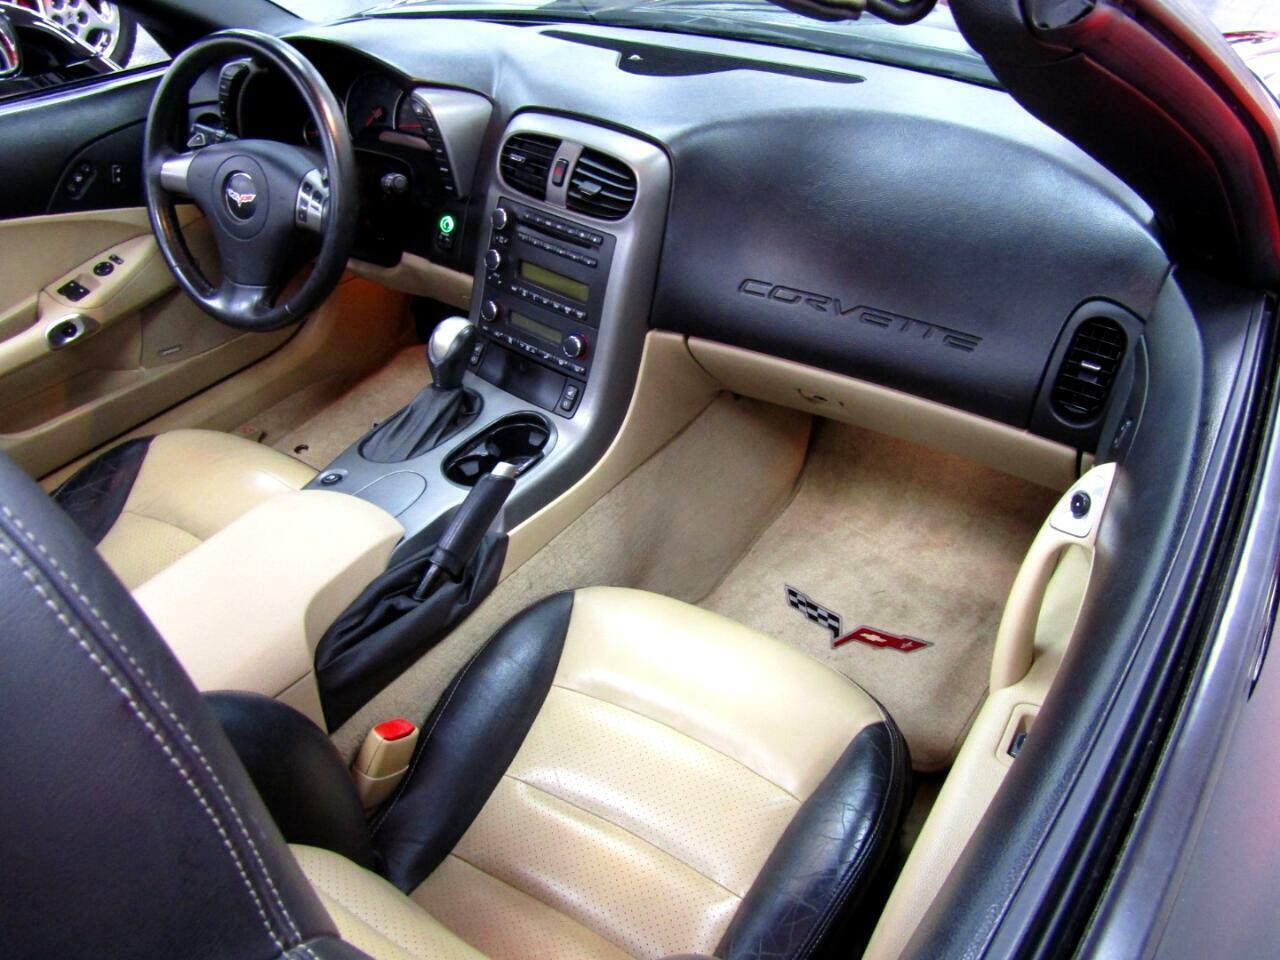 2007 Black Chevrolet Corvette Convertible    C6 Corvette Photo 8